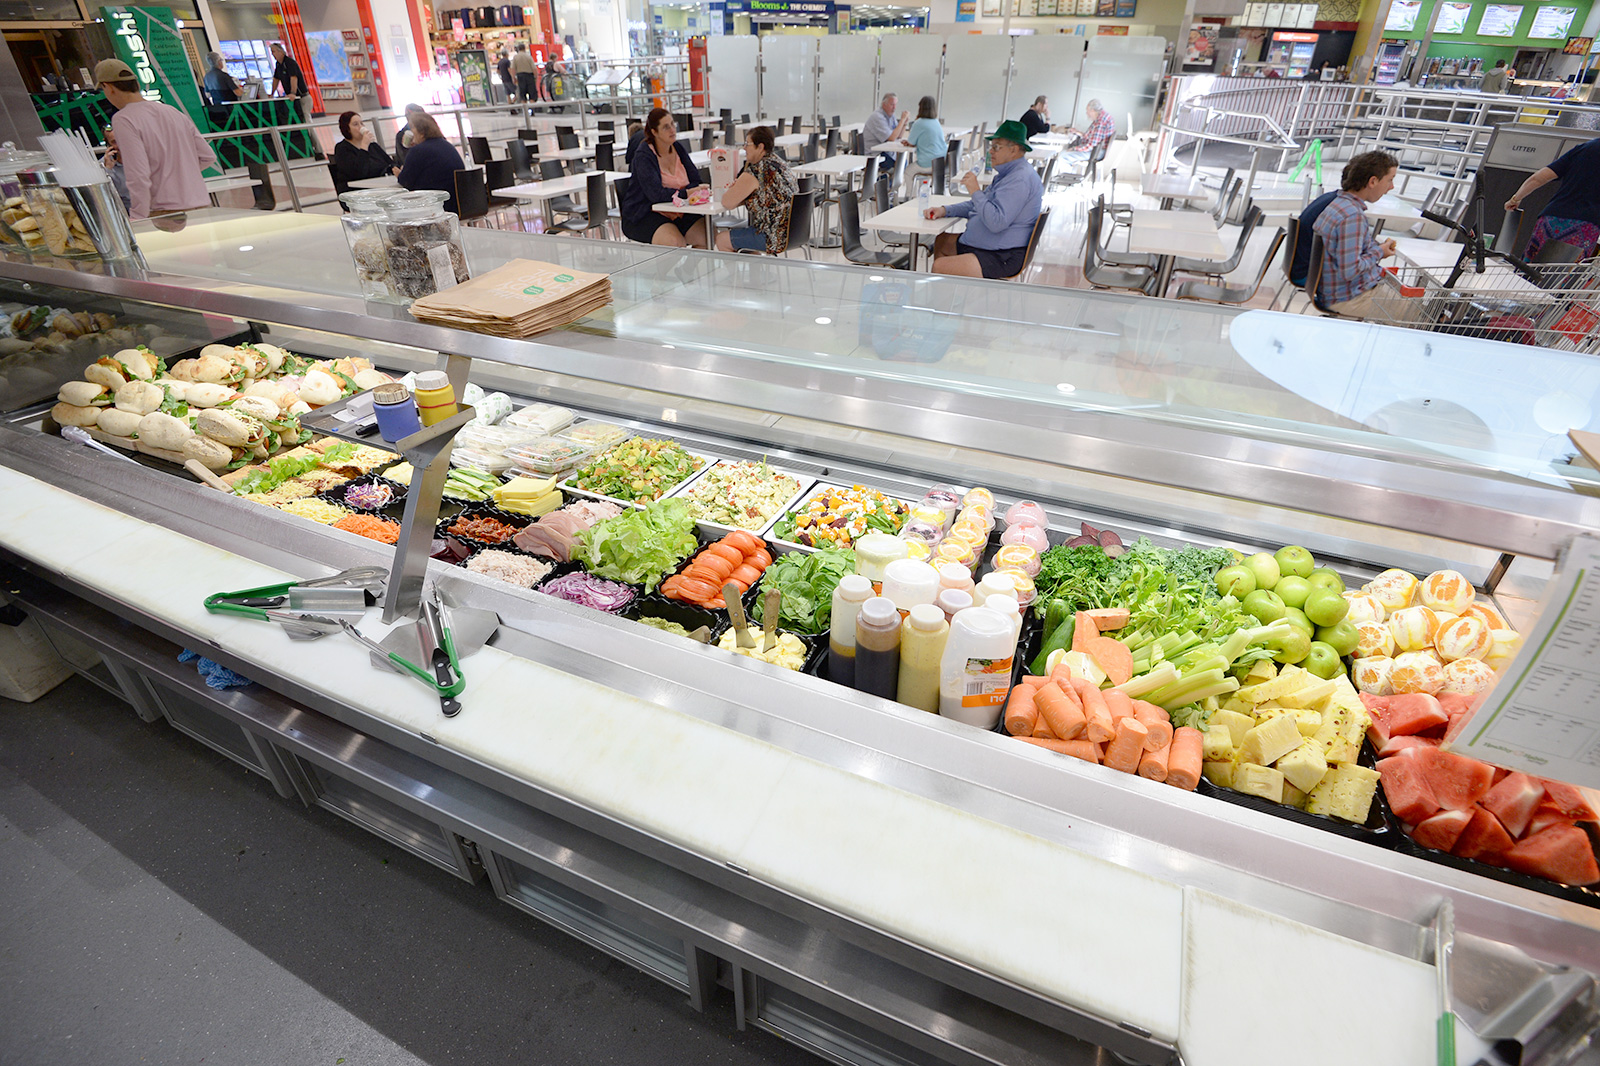 take-a-way-sandwich-shop-healthy-habits-grafton-shopping-world-reduced-price-1